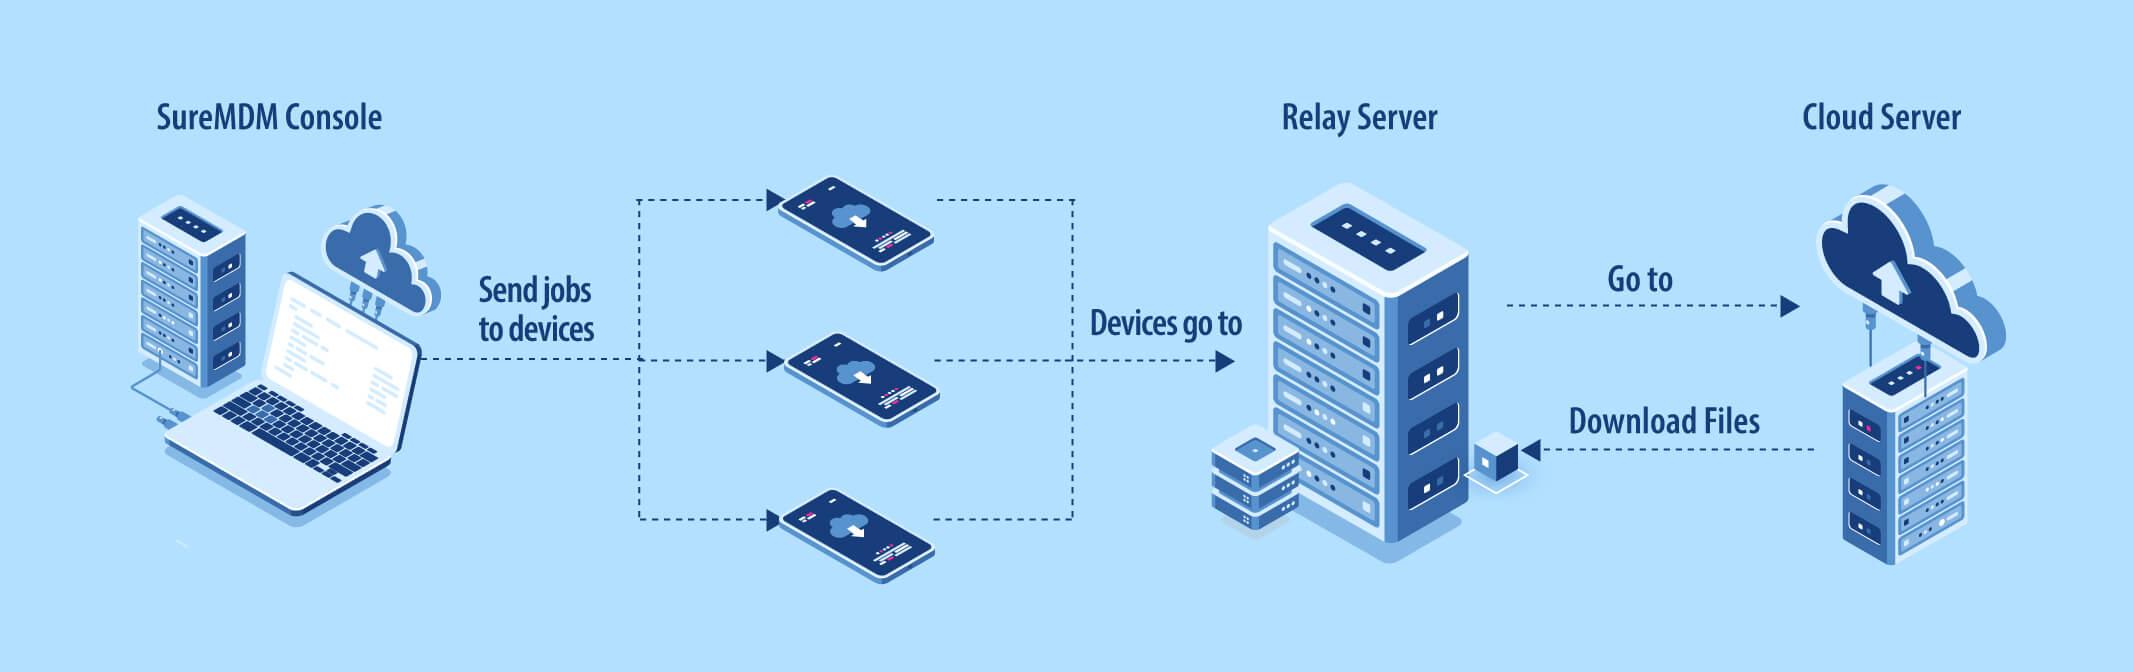 Iluustration-relay-server